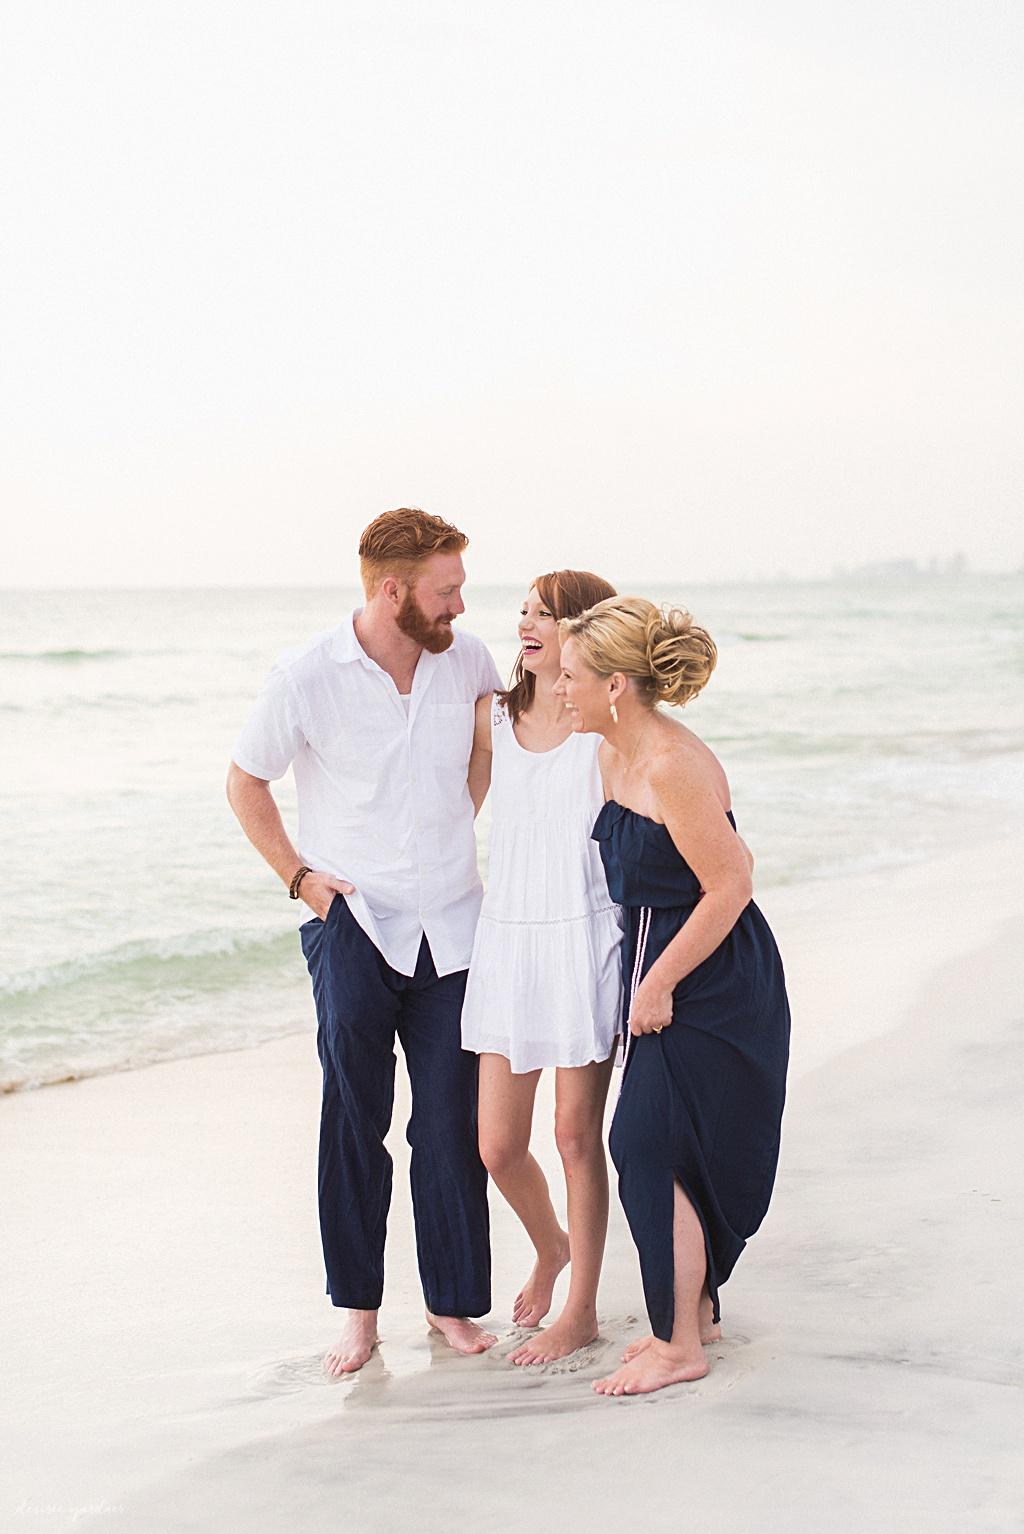 panama-city-beach-30a-wedding-photographer-family-destination_0531